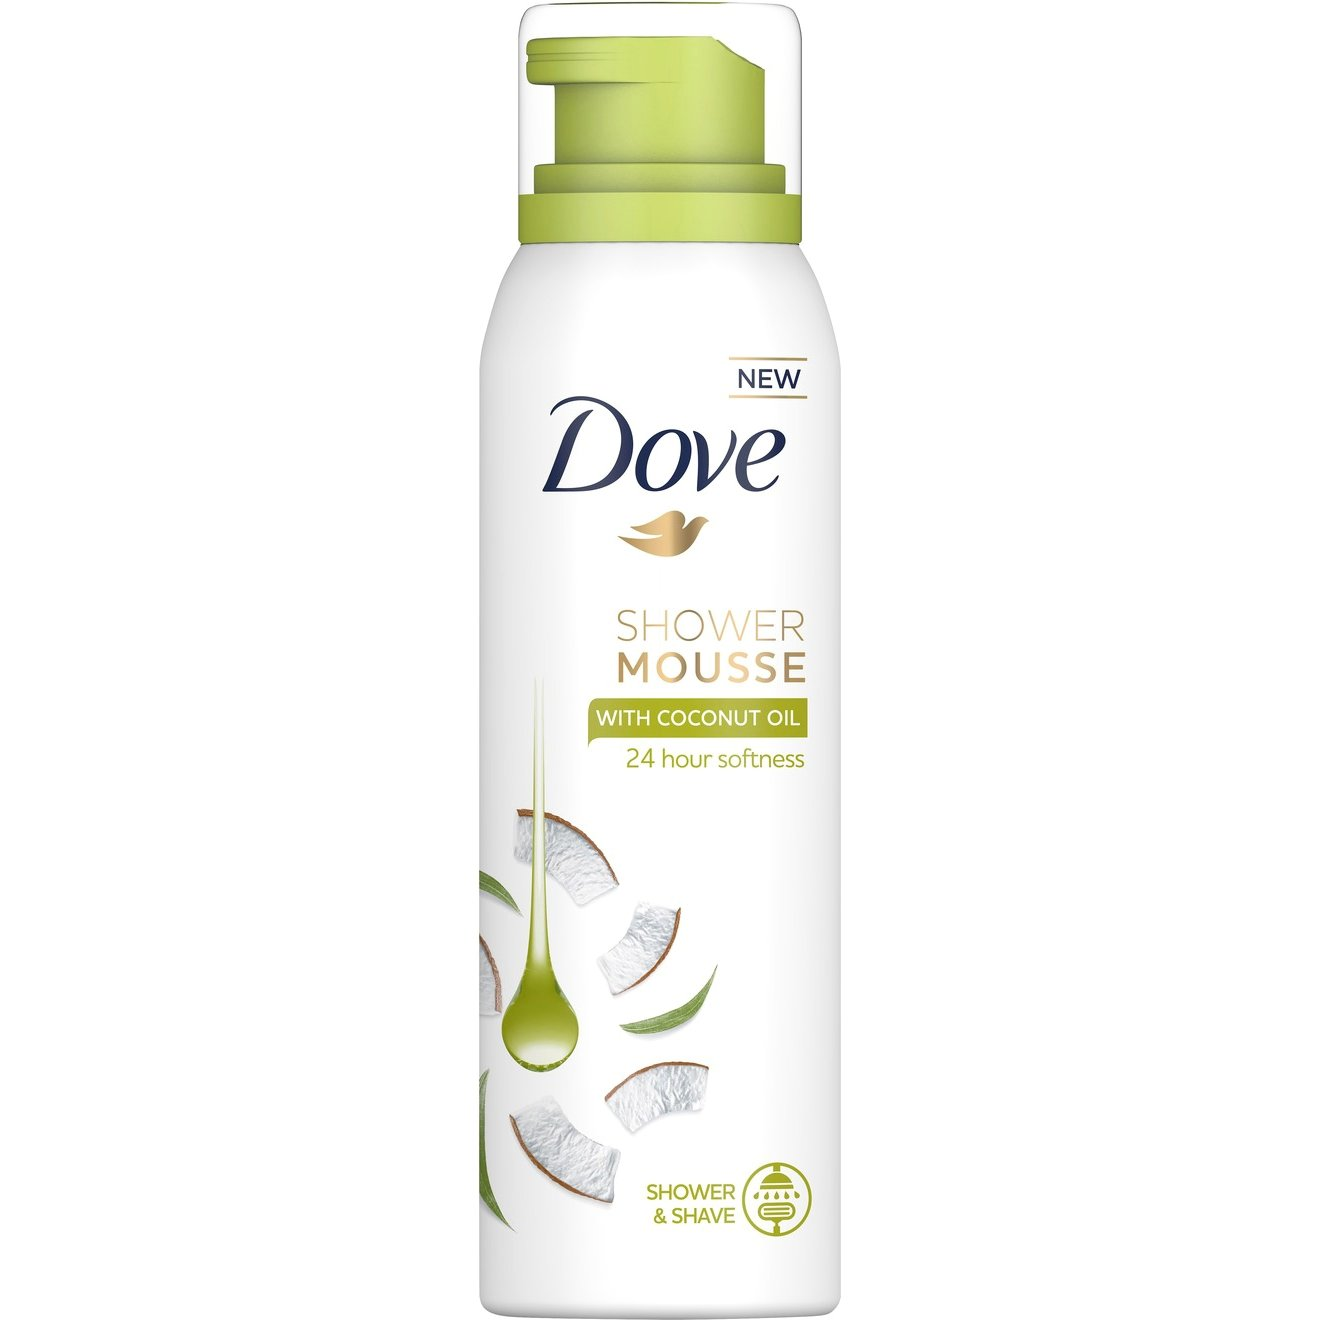 Dove Body Wash Shower Mousse with Coconut Oil Απαλός Αφρός Καθαρισμού & Περιποίησης της Επιδερμίδας με Έλαιο Καρύδας 200ml